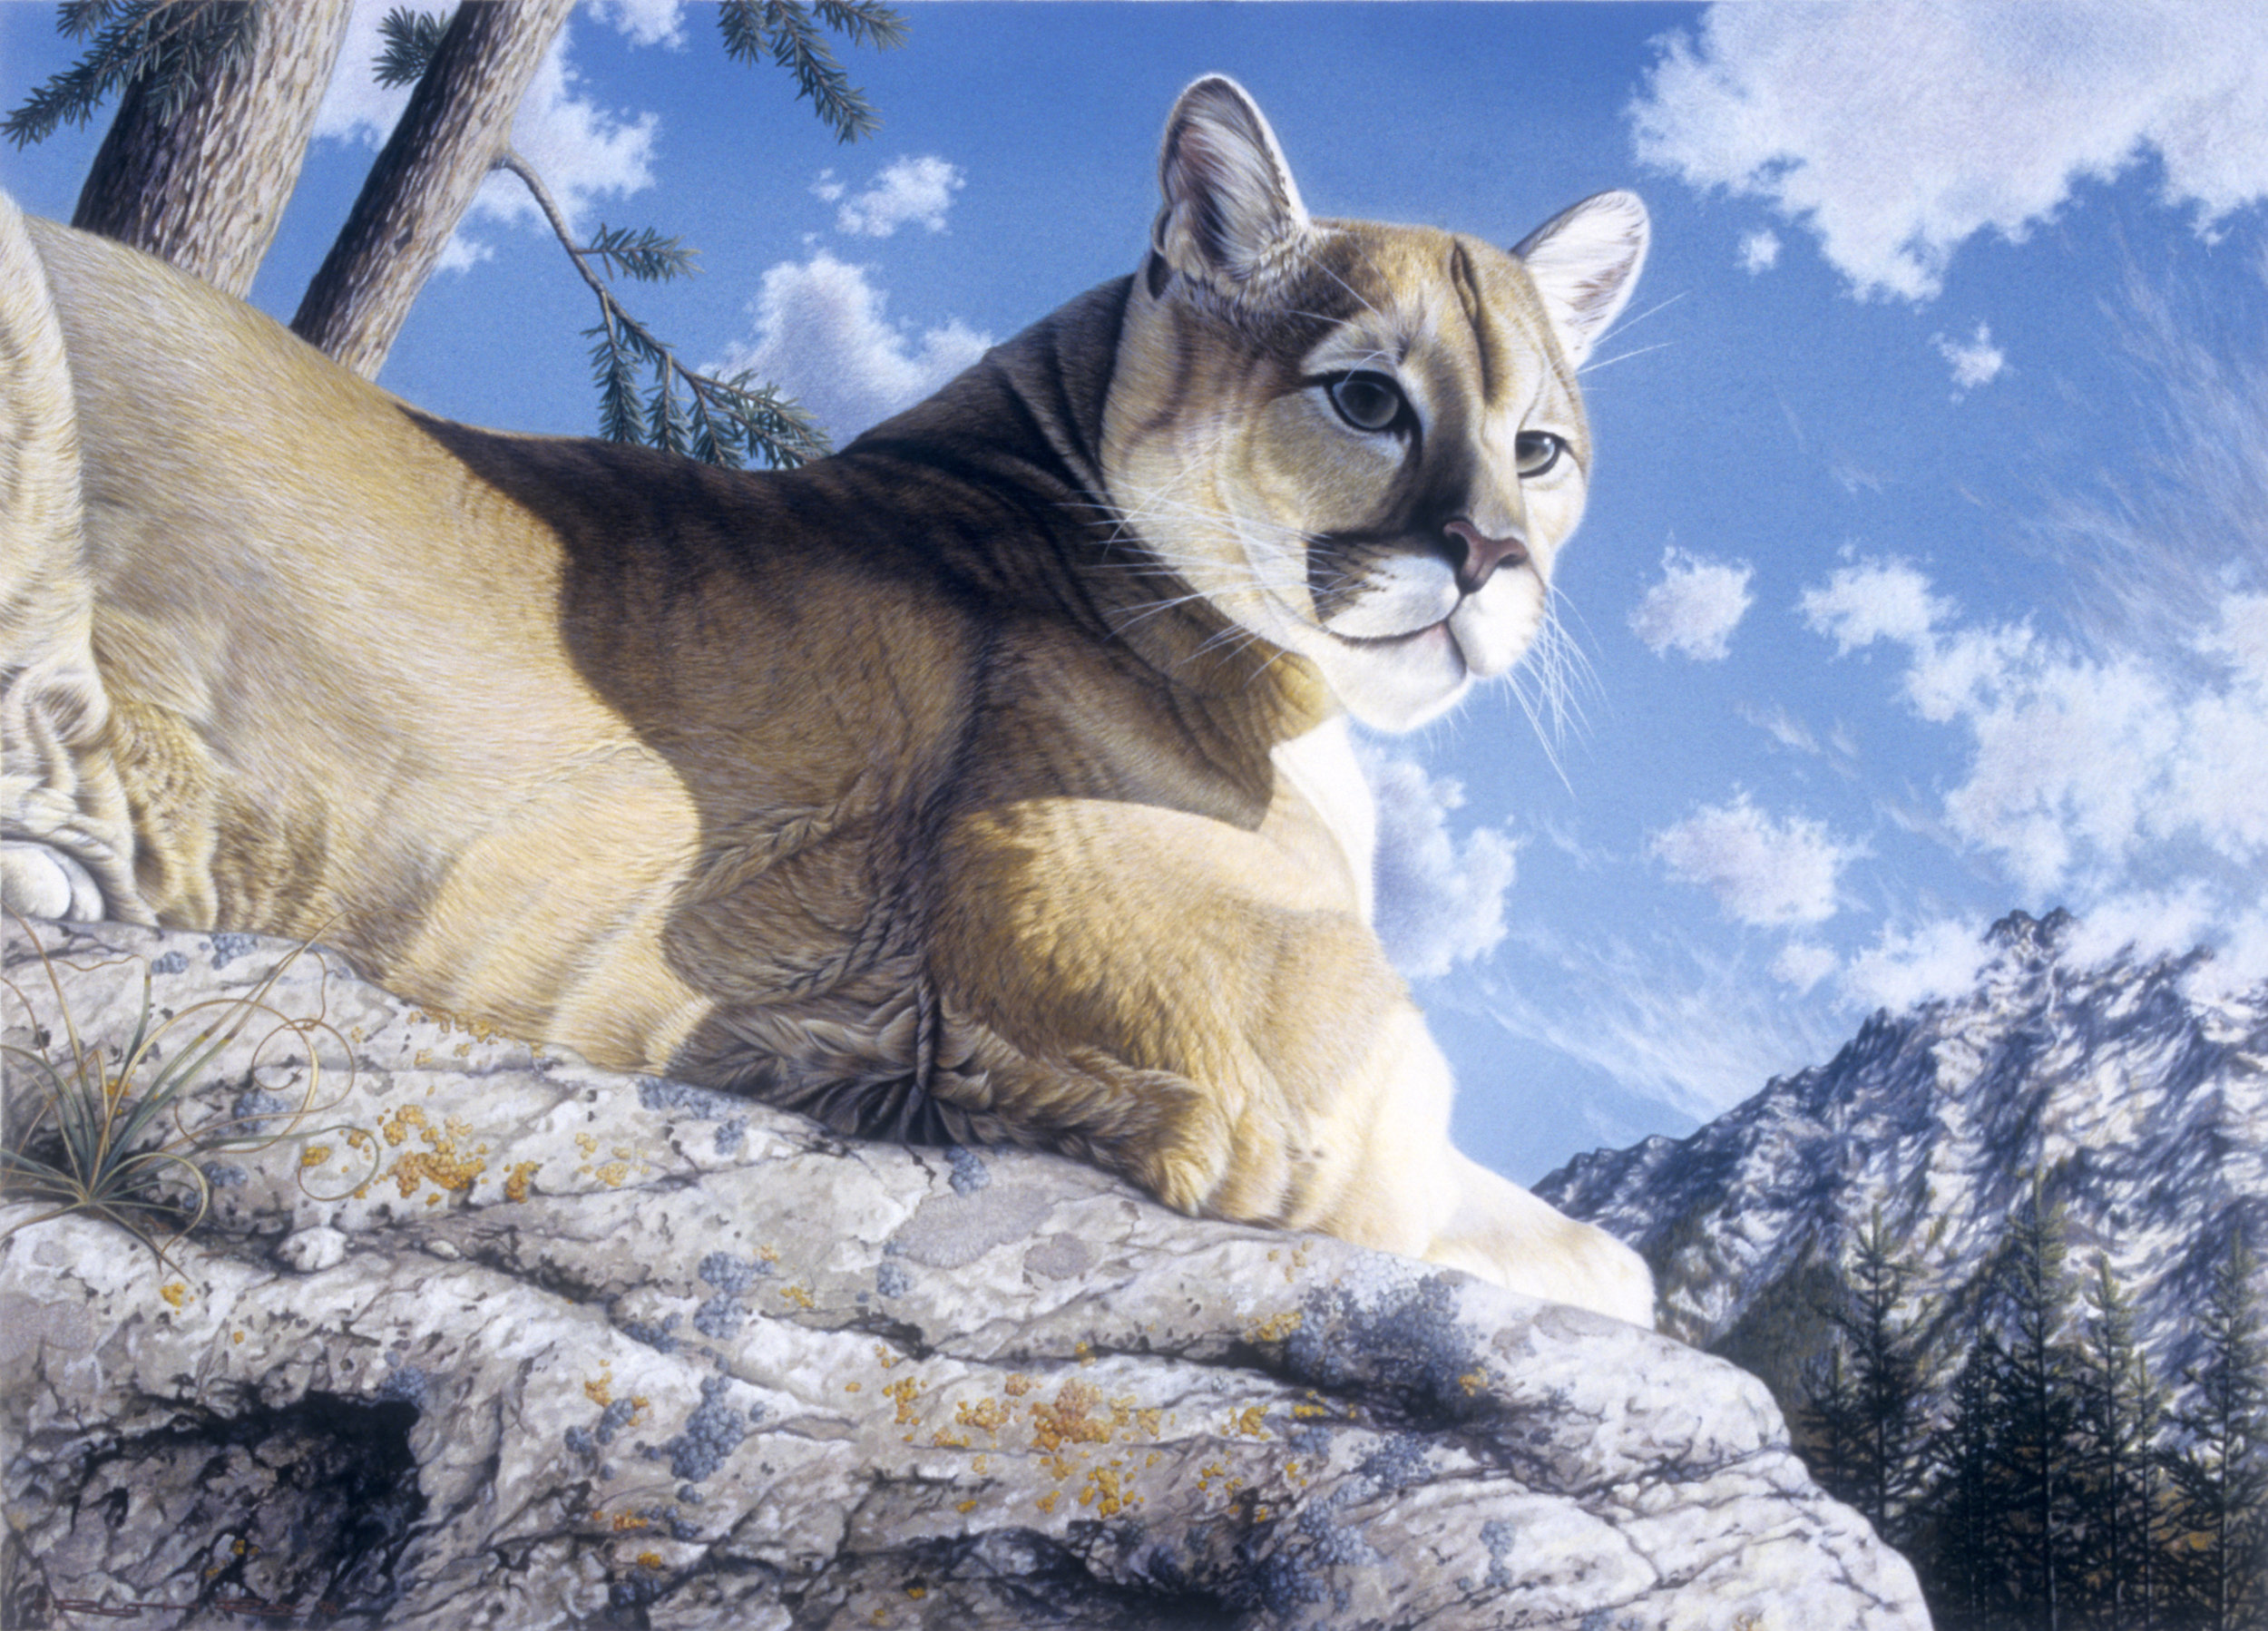 Western Mountain Lion